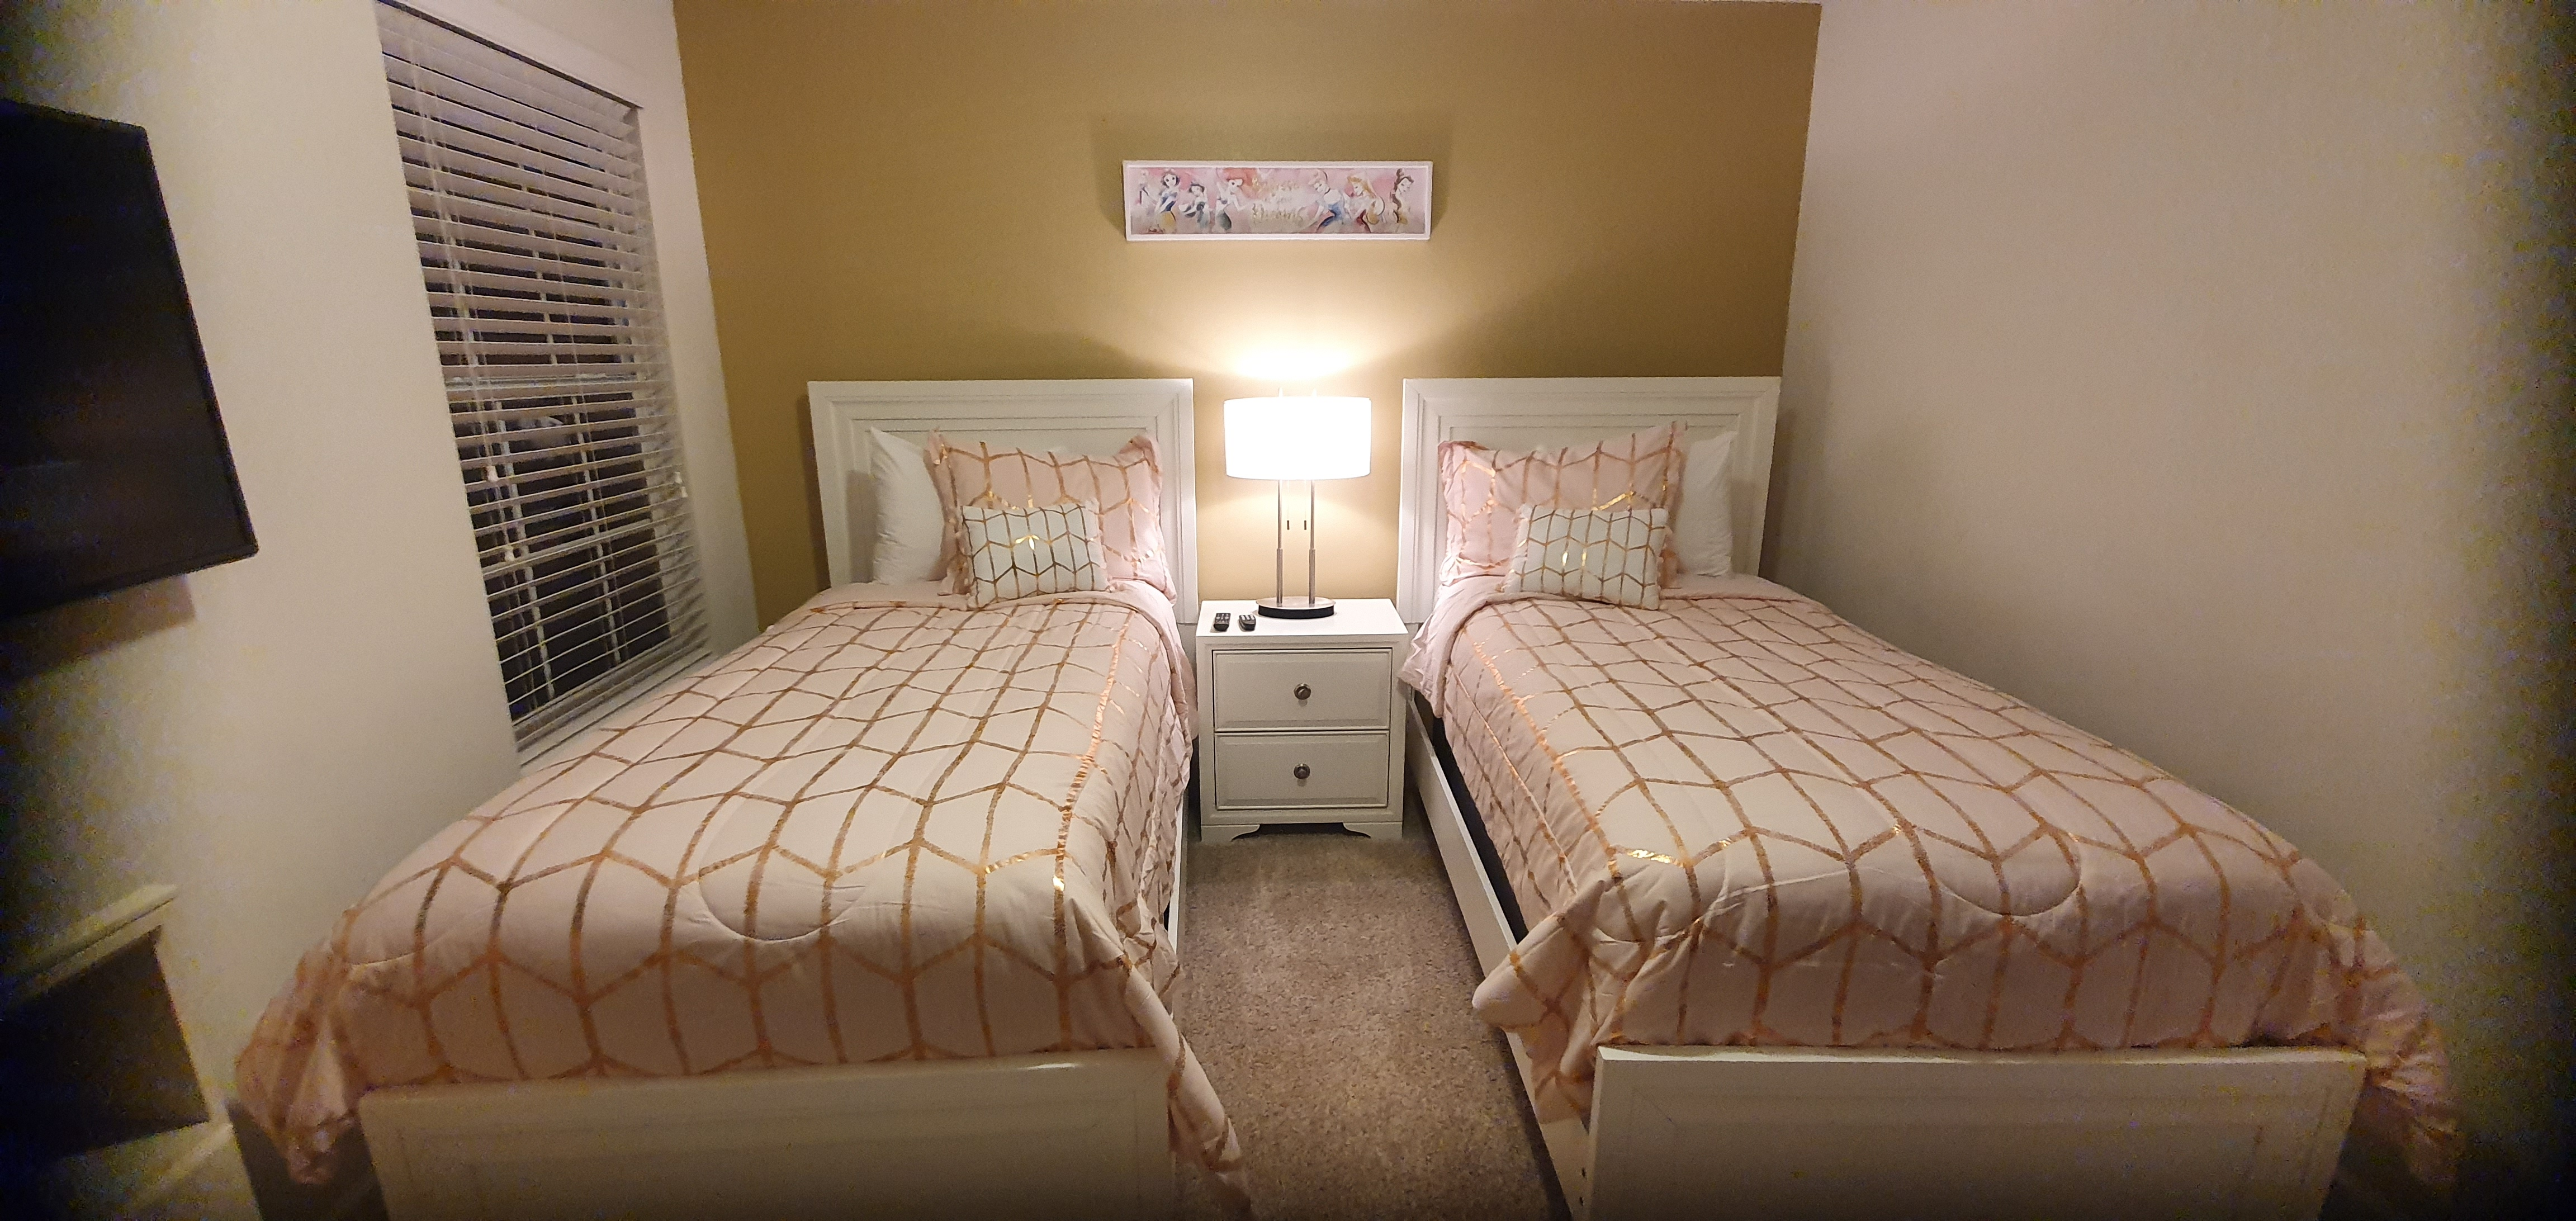 Apartment Villa  10 min from Disney  Golf  Wetpark all new photo 24719362